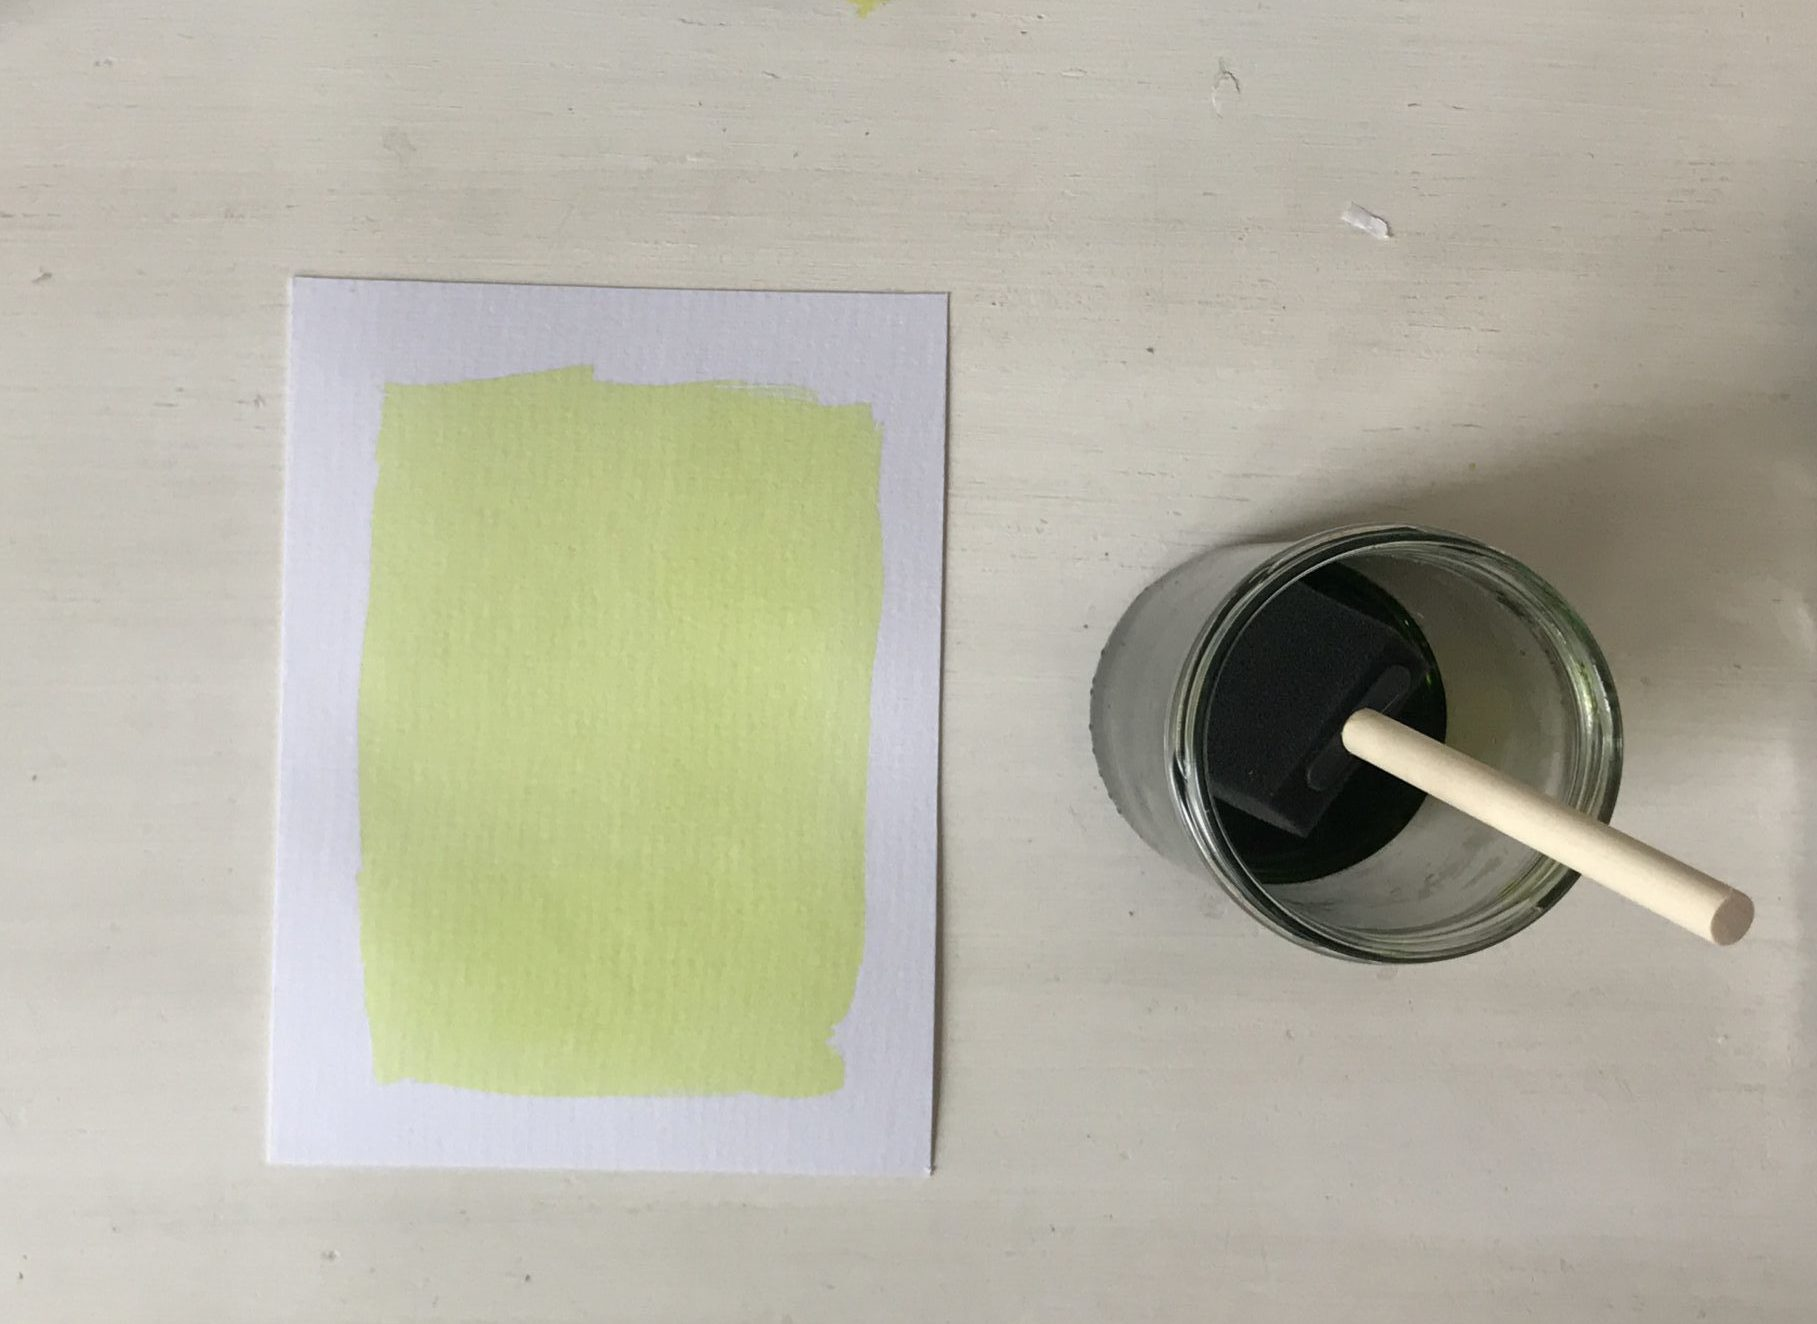 Lichtgevoelig papier zonneprint cyanotypie anna atkins